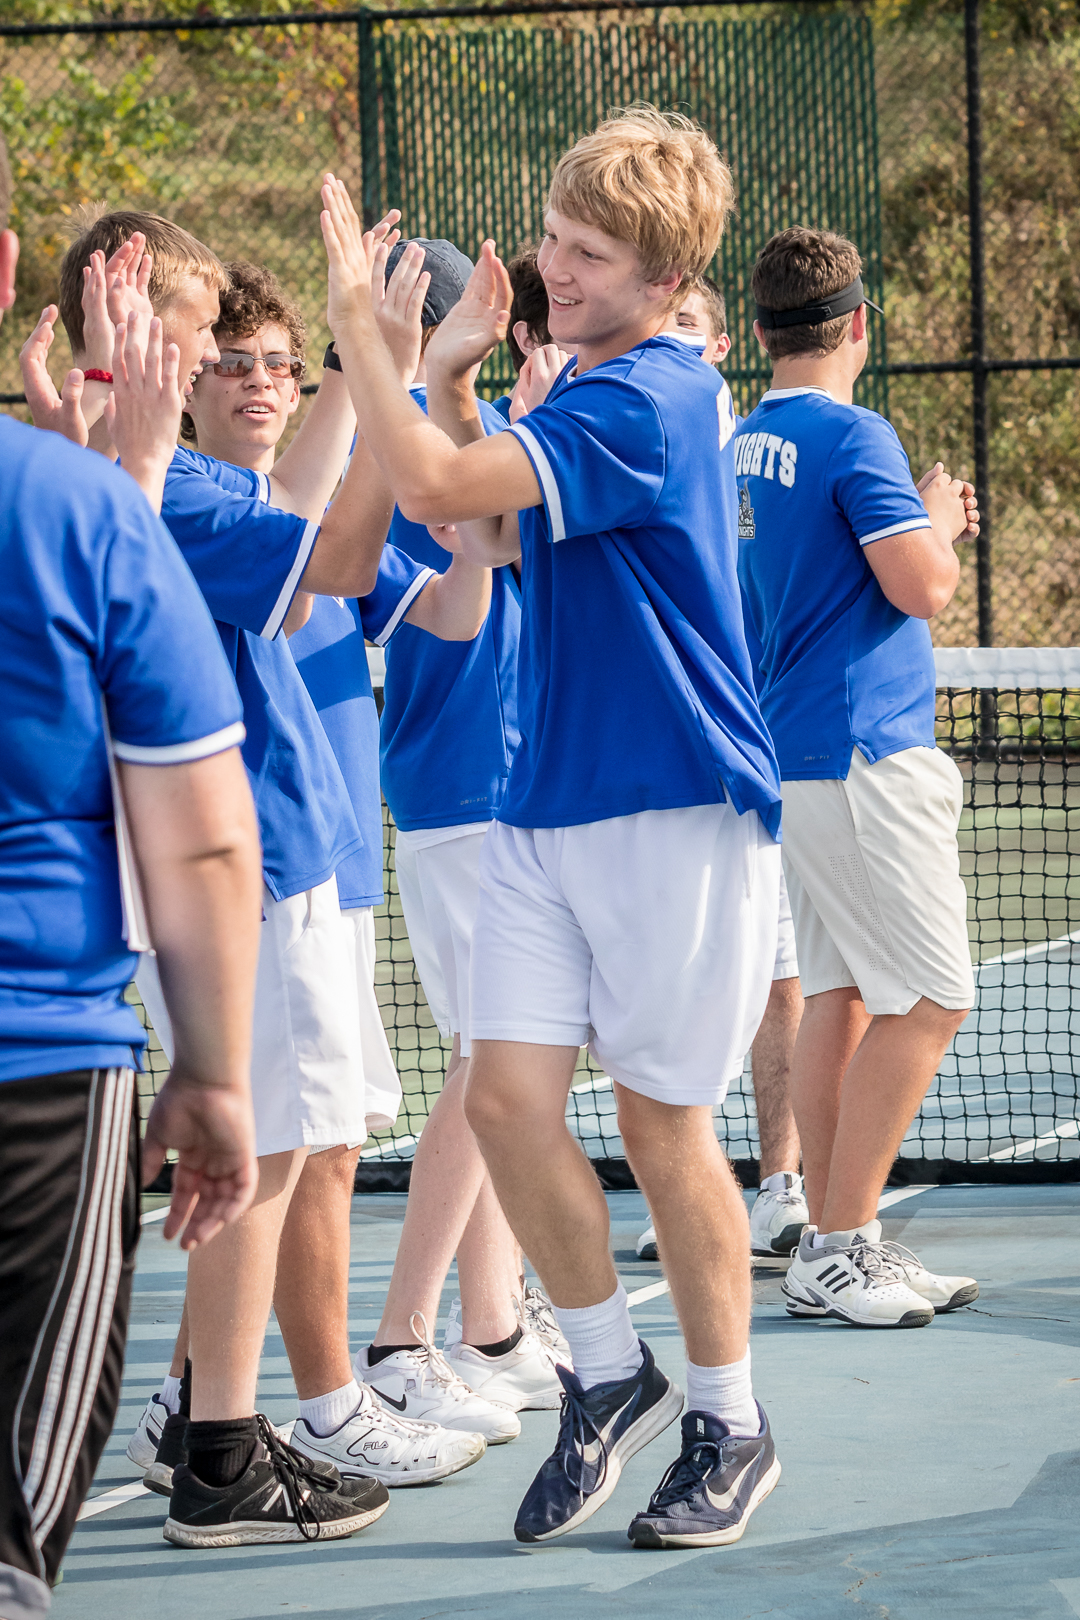 Marian-Boys-Tennis-1606.jpg